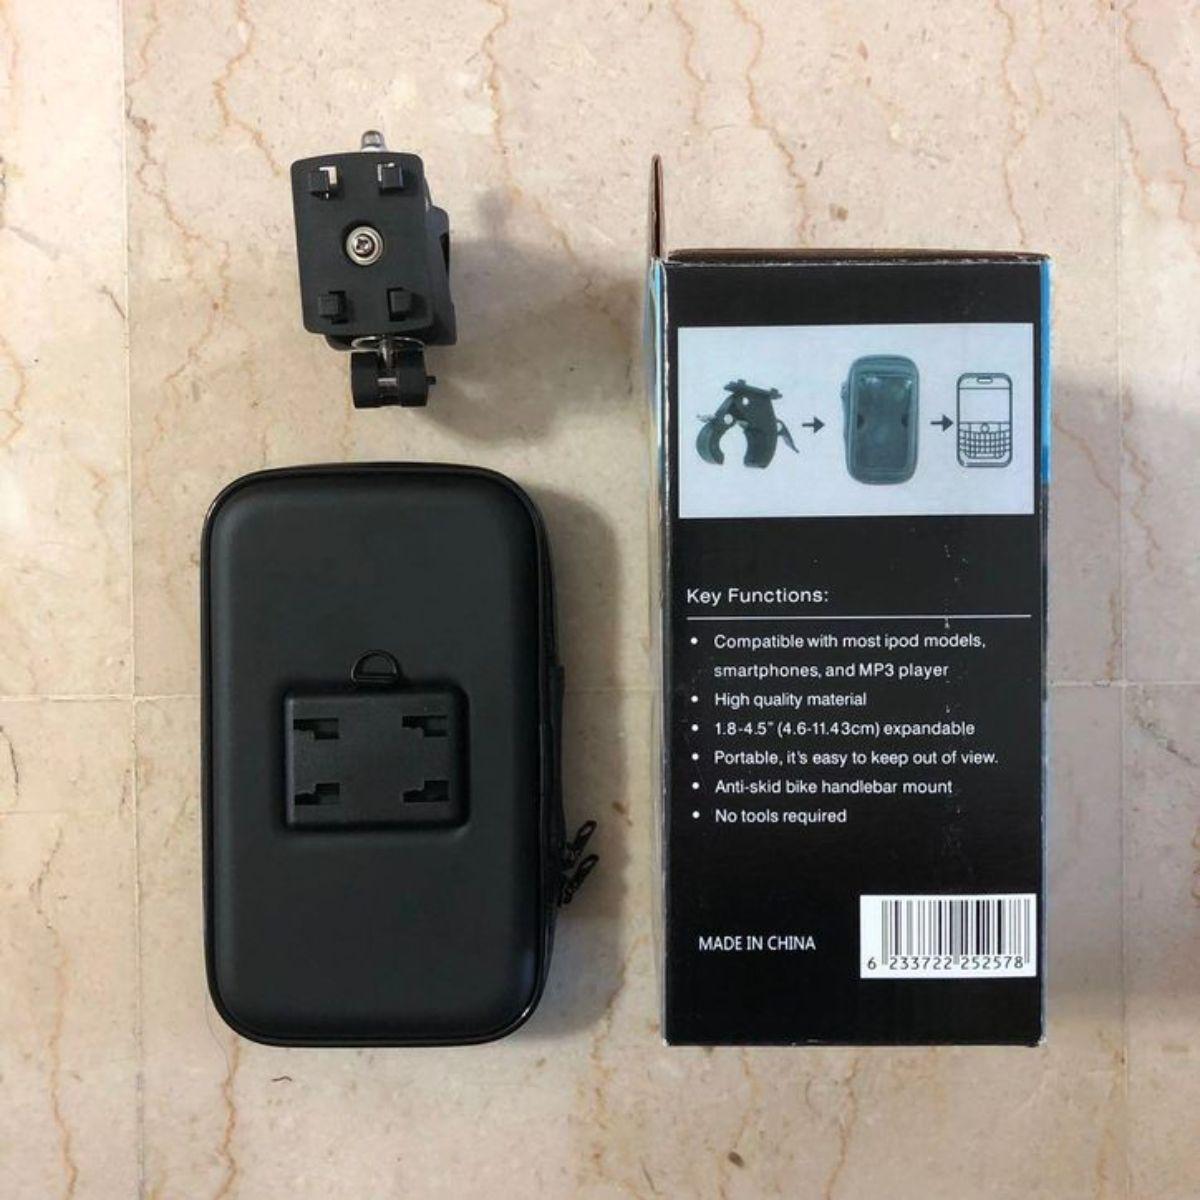 soporte universal para telefono movil 3 1